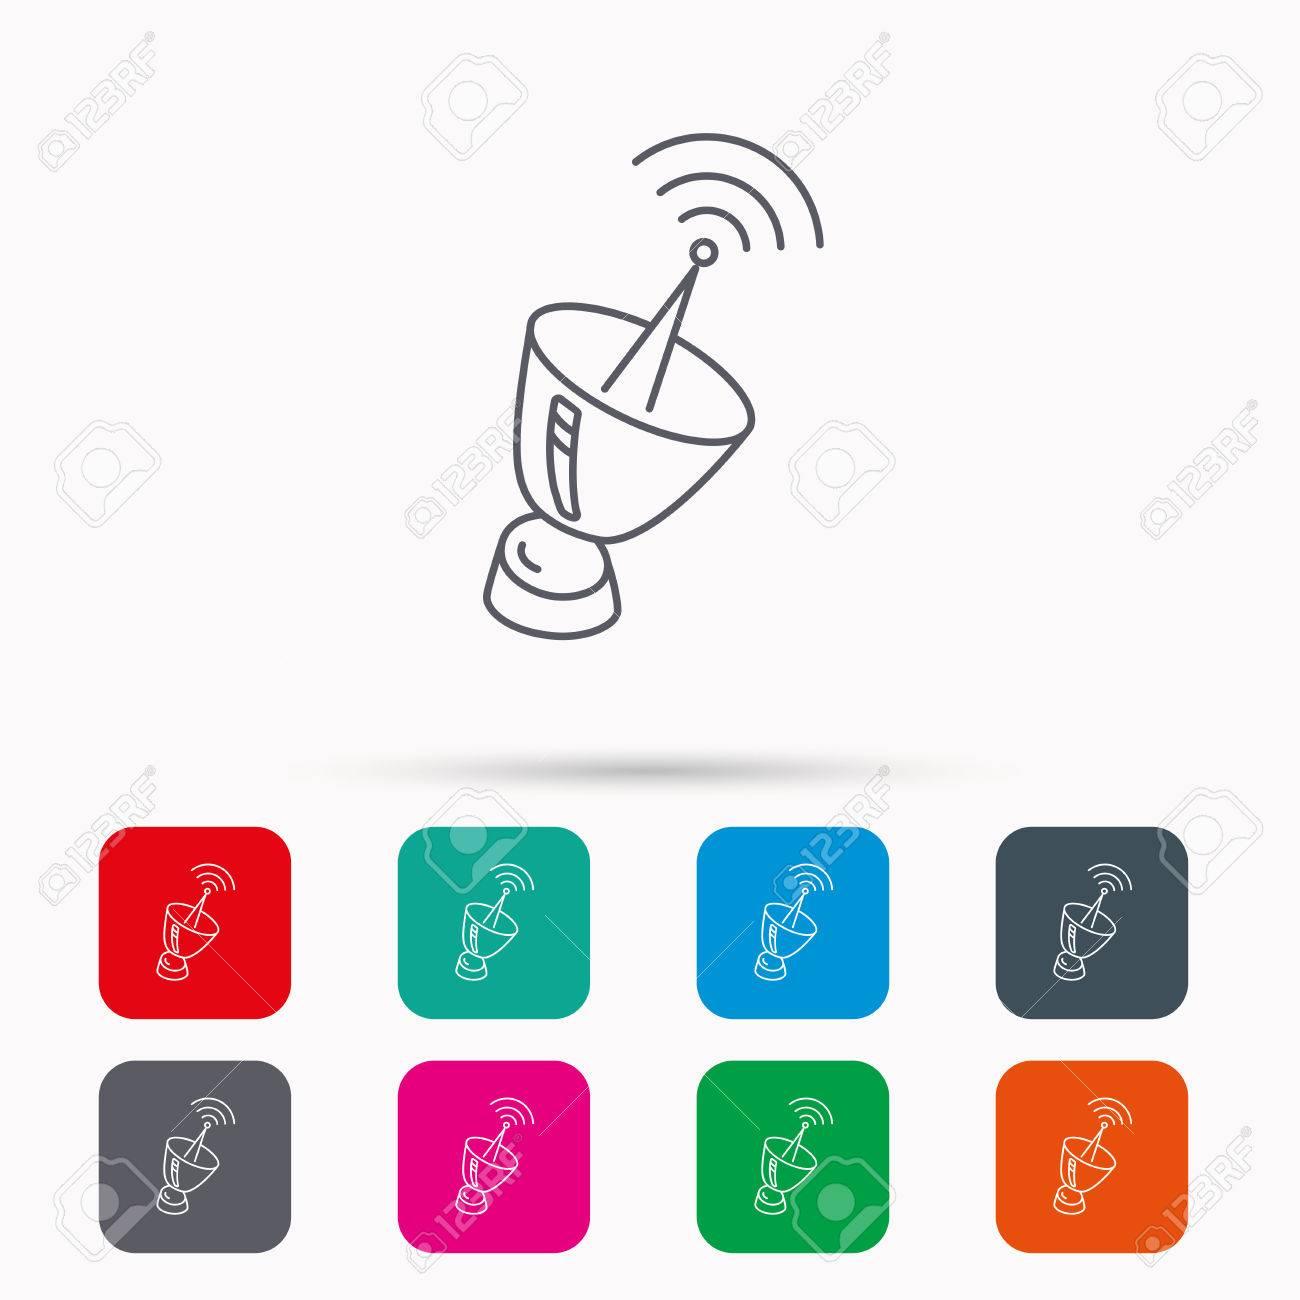 Xm radio ticker symbol курсы форекс на рабочий стол